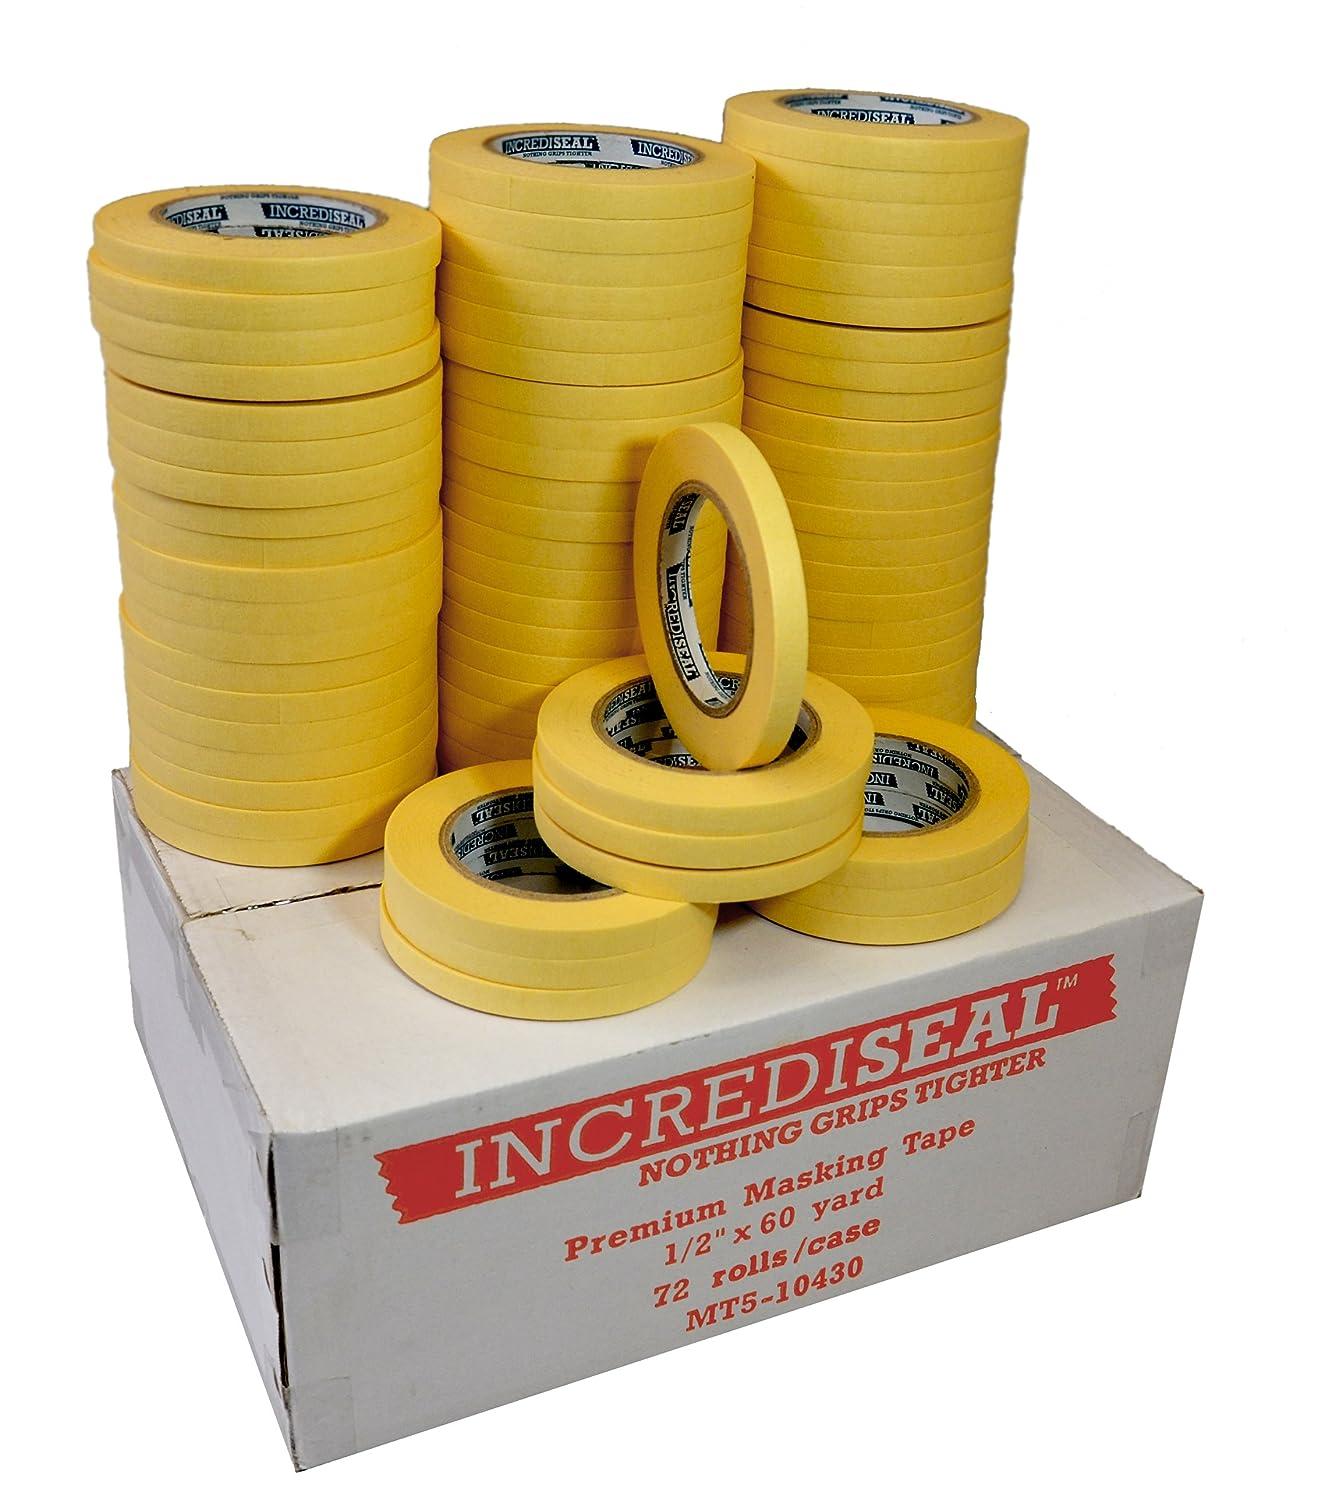 INCREDISEAL 72 Rolls High Tack Tape, 0.5 Inch x 60 Yards x 4.3 Mil - Crepe / Natural